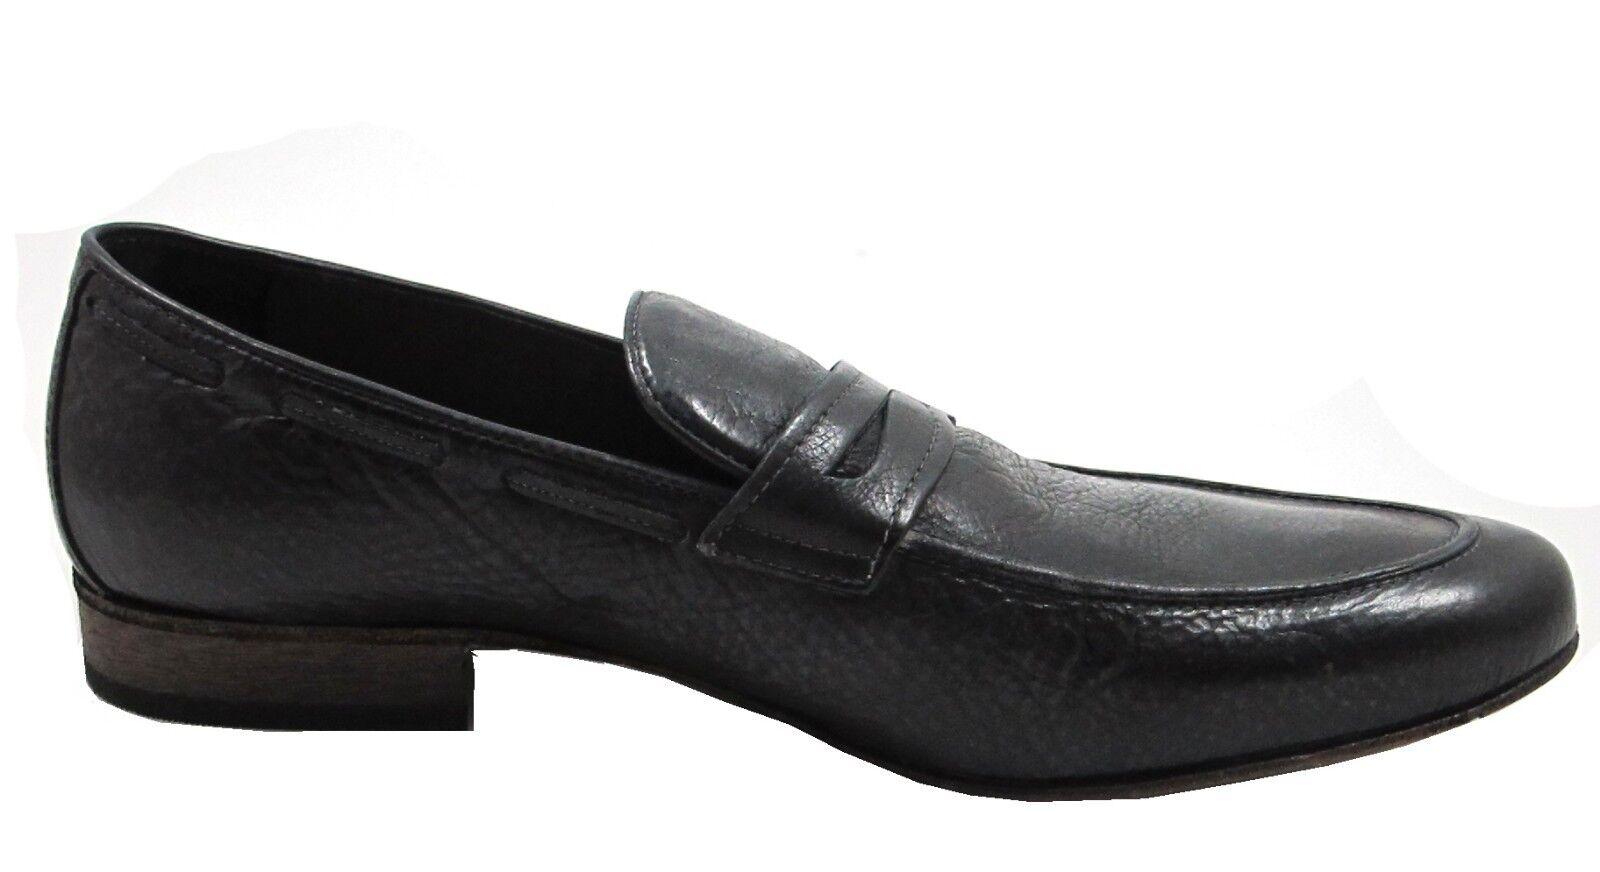 Davinci Para Hombre Italiano elegante elegante elegante mocasín 9773 660d9e